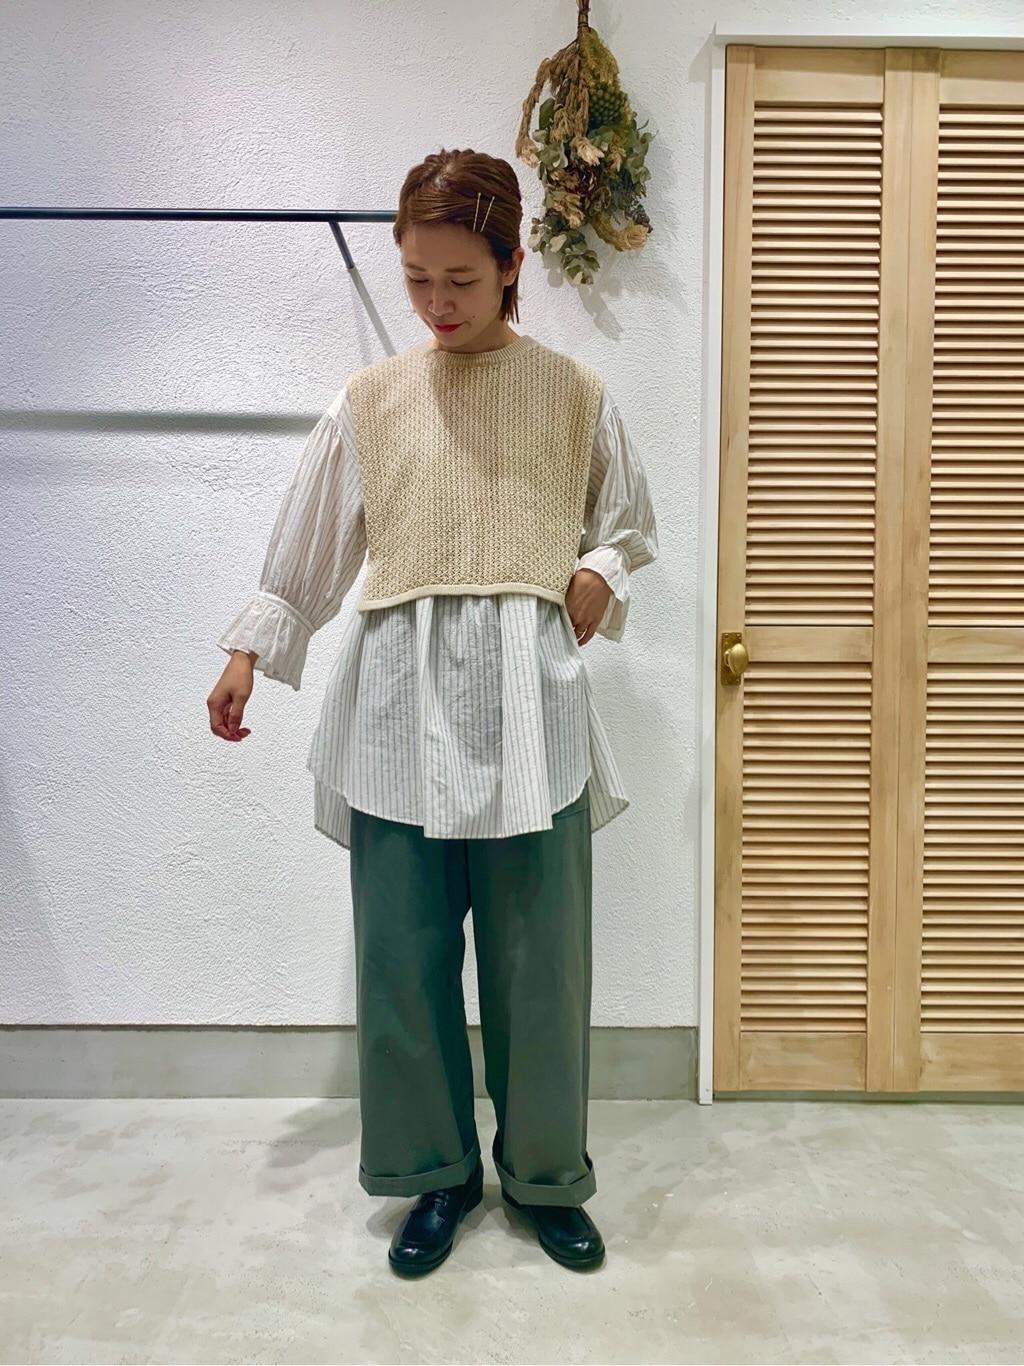 chambre de charme 横浜ジョイナス 身長:160cm 2020.07.23